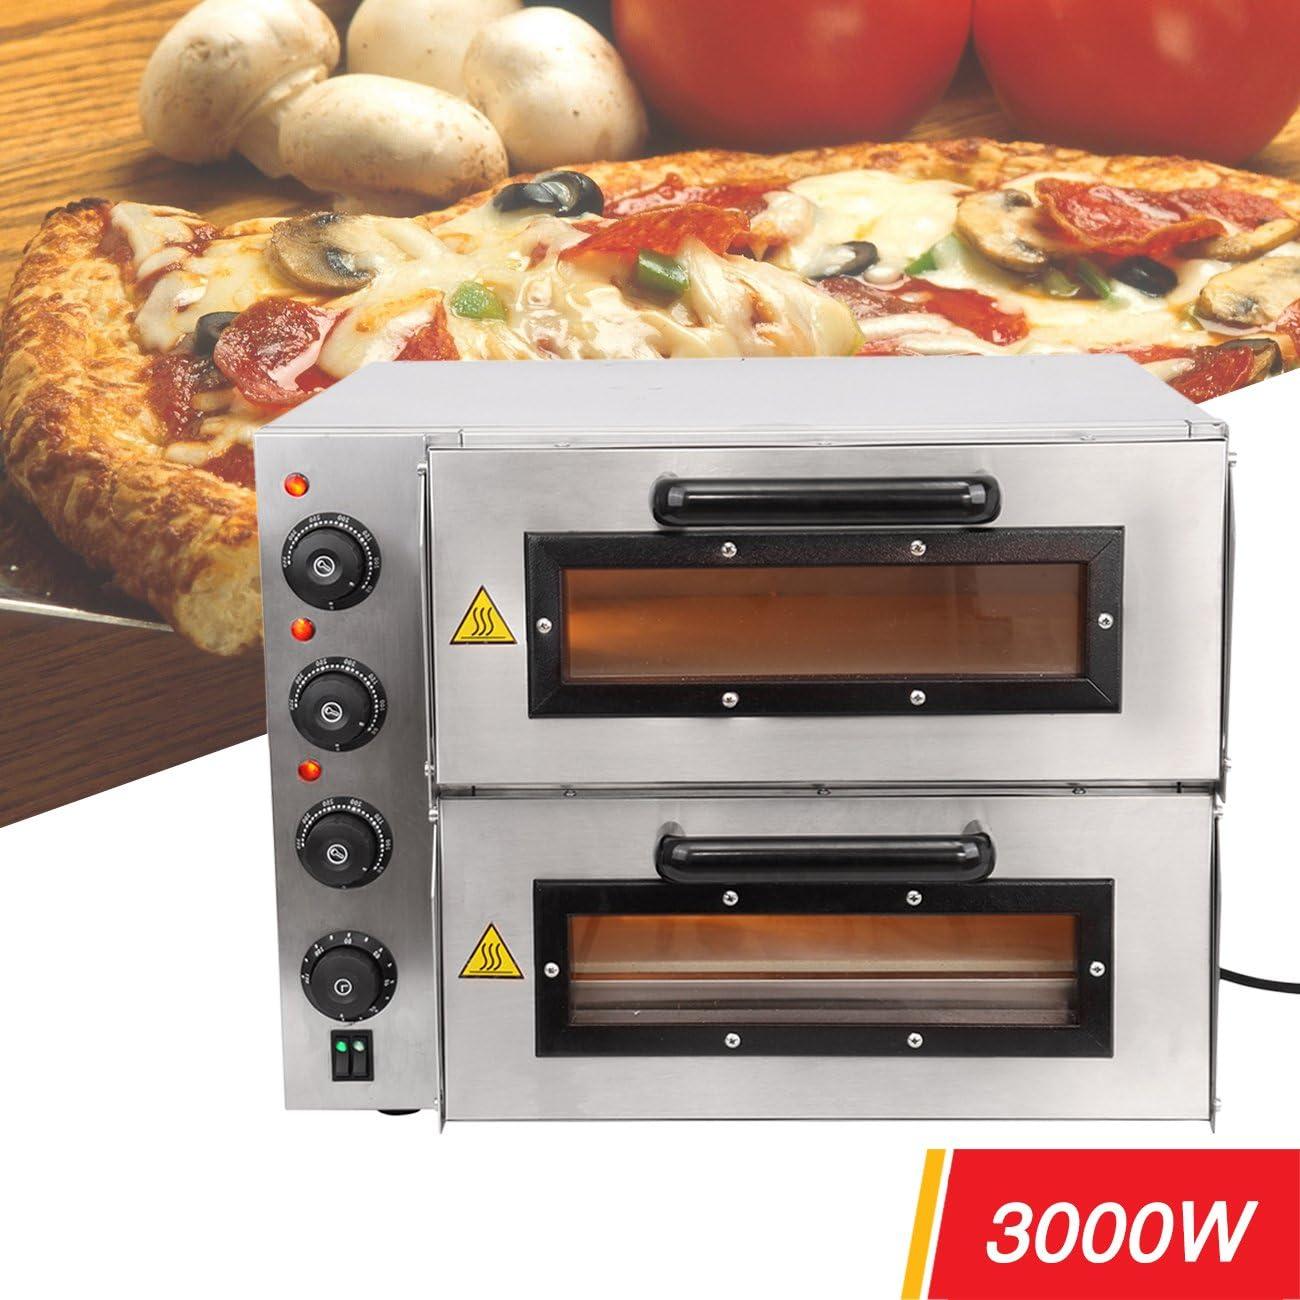 Camry CR 6015r cr6015r Four /à Pizza 1300 W Rouge